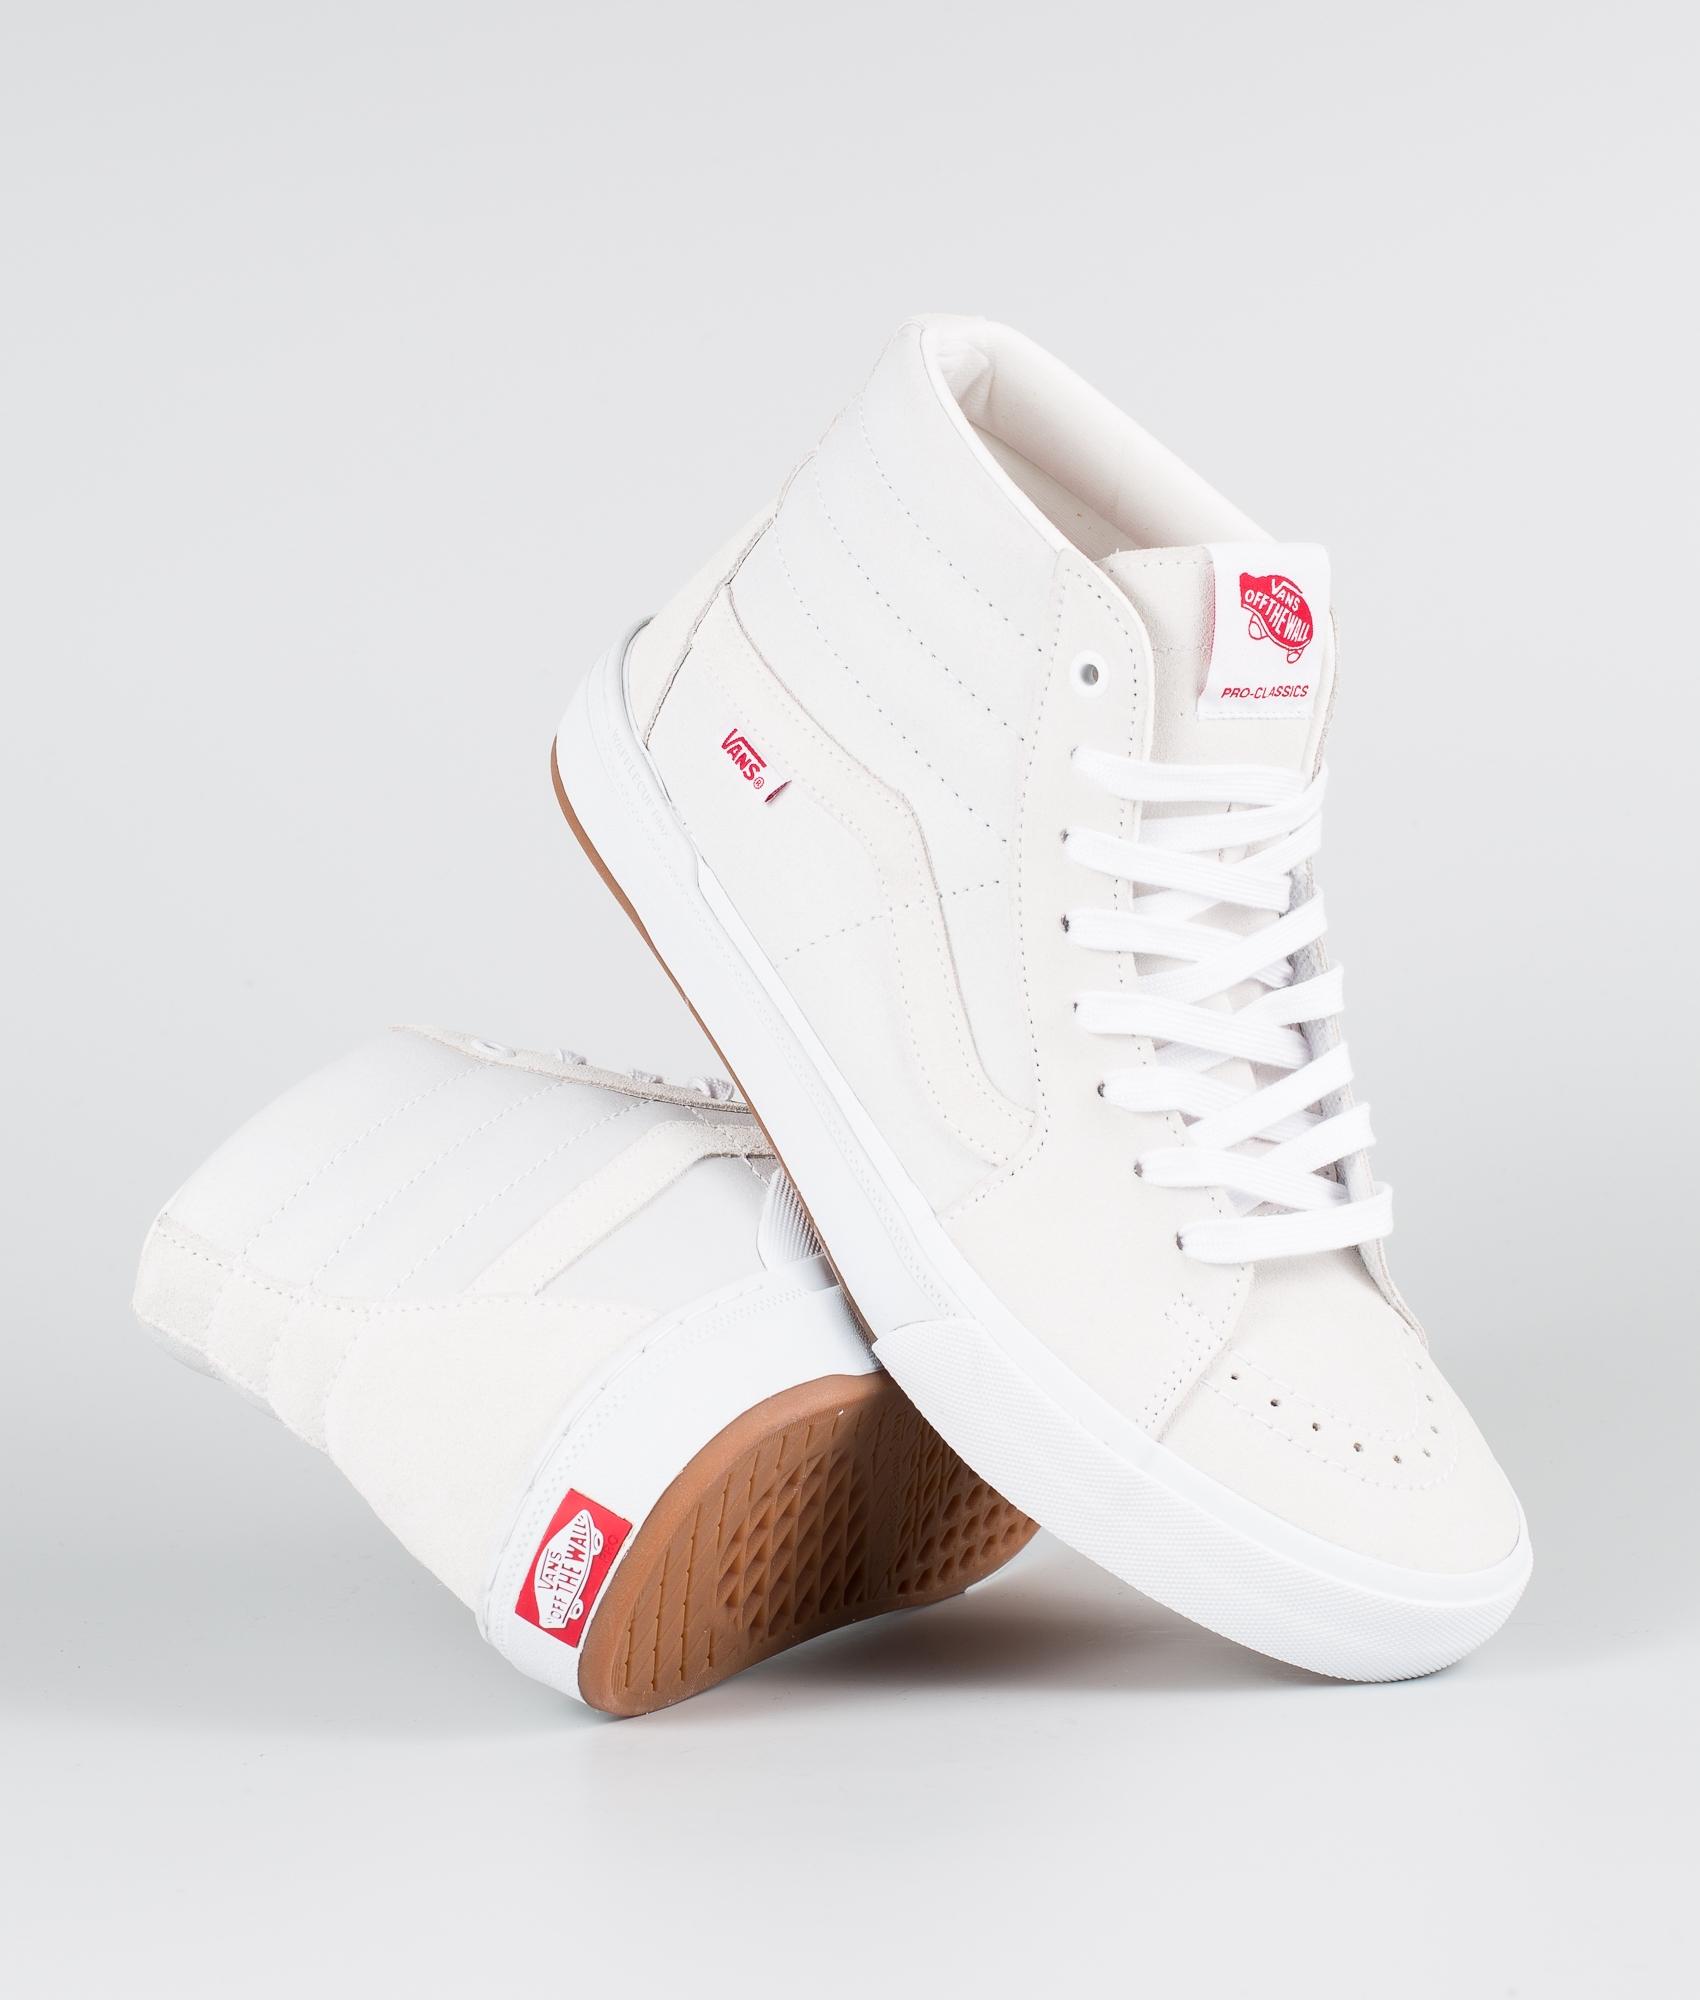 Vans Sk8-Hi Pro Bmx Shoes (Scotty Cranmer) White